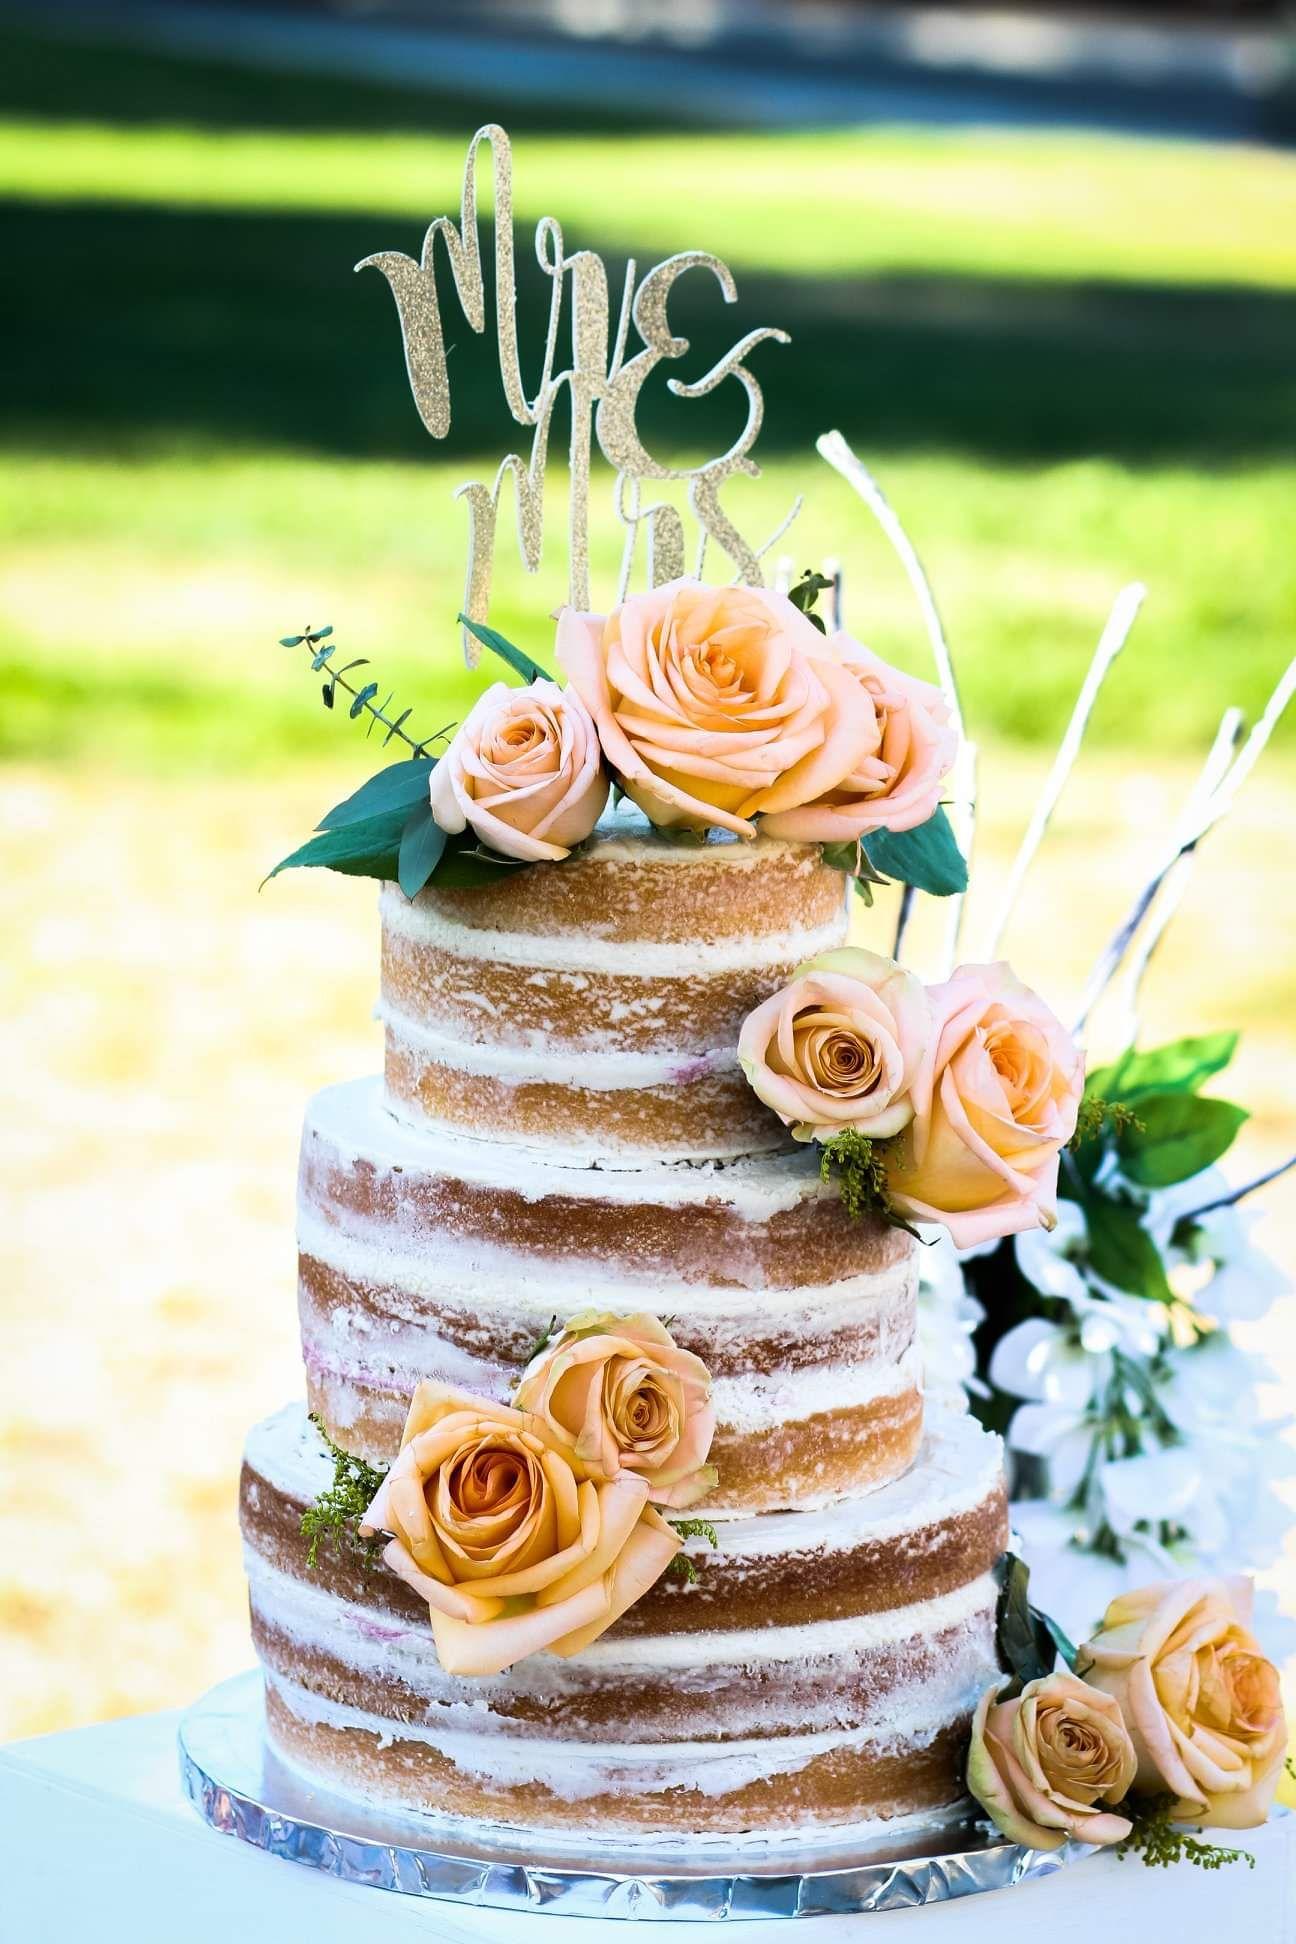 White Almond Wedding Cake Recipe in 2020 Wedding cake